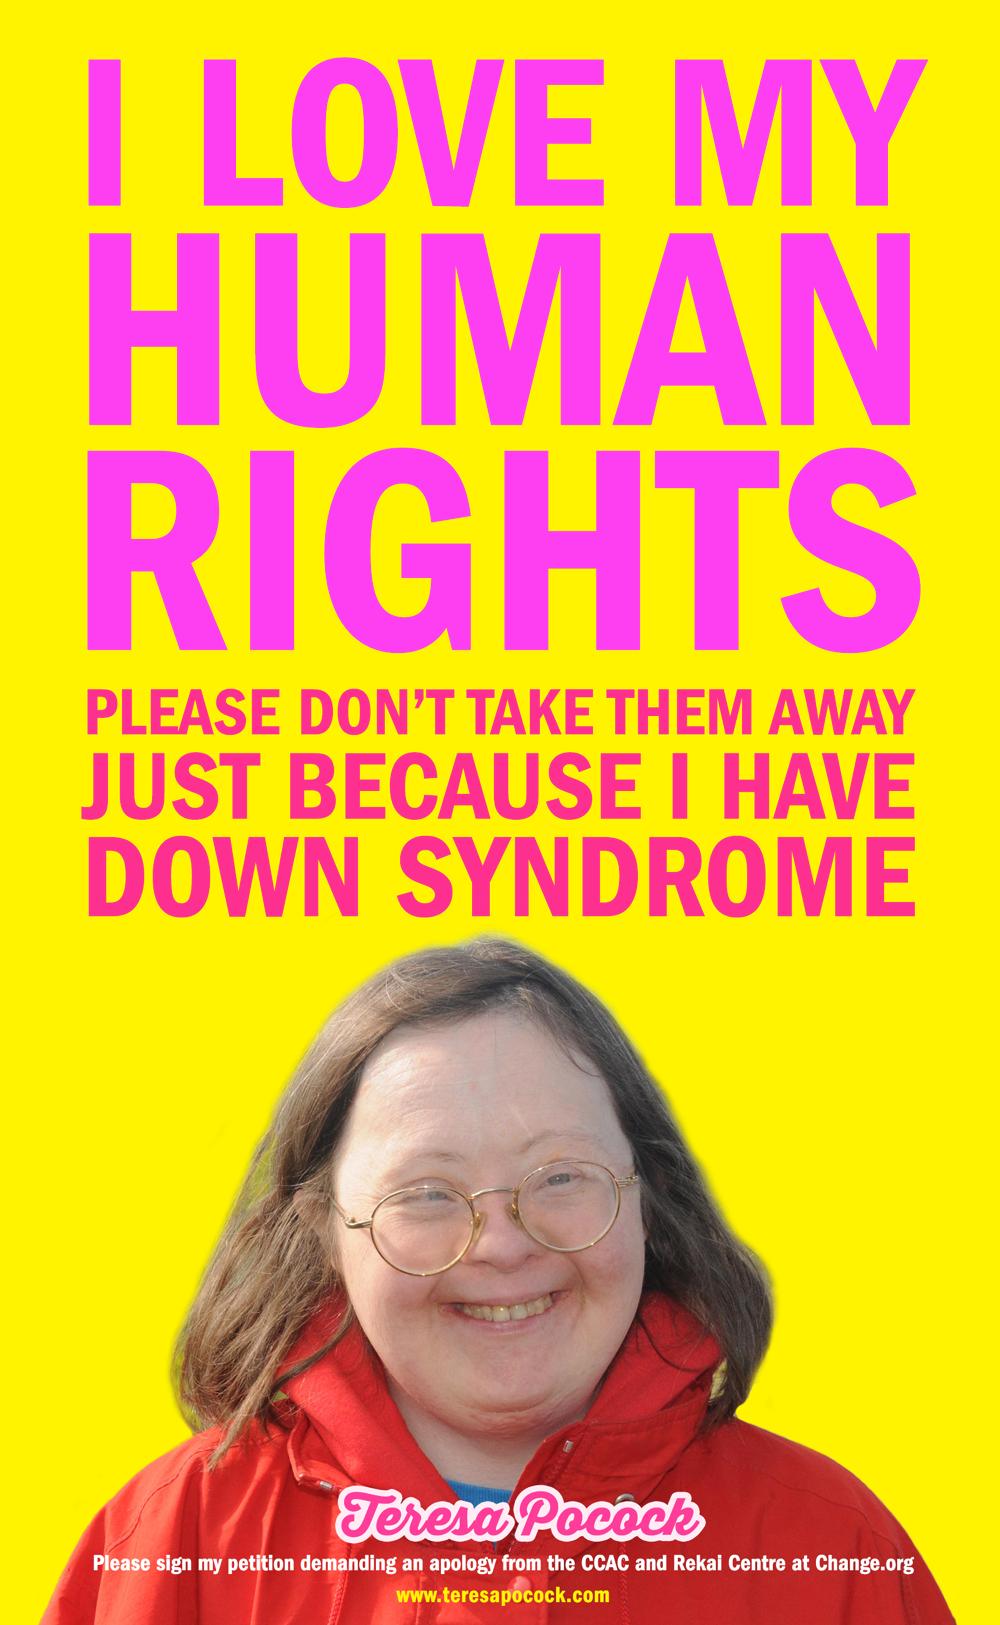 Teresa Pocock: I Love My Human Rights